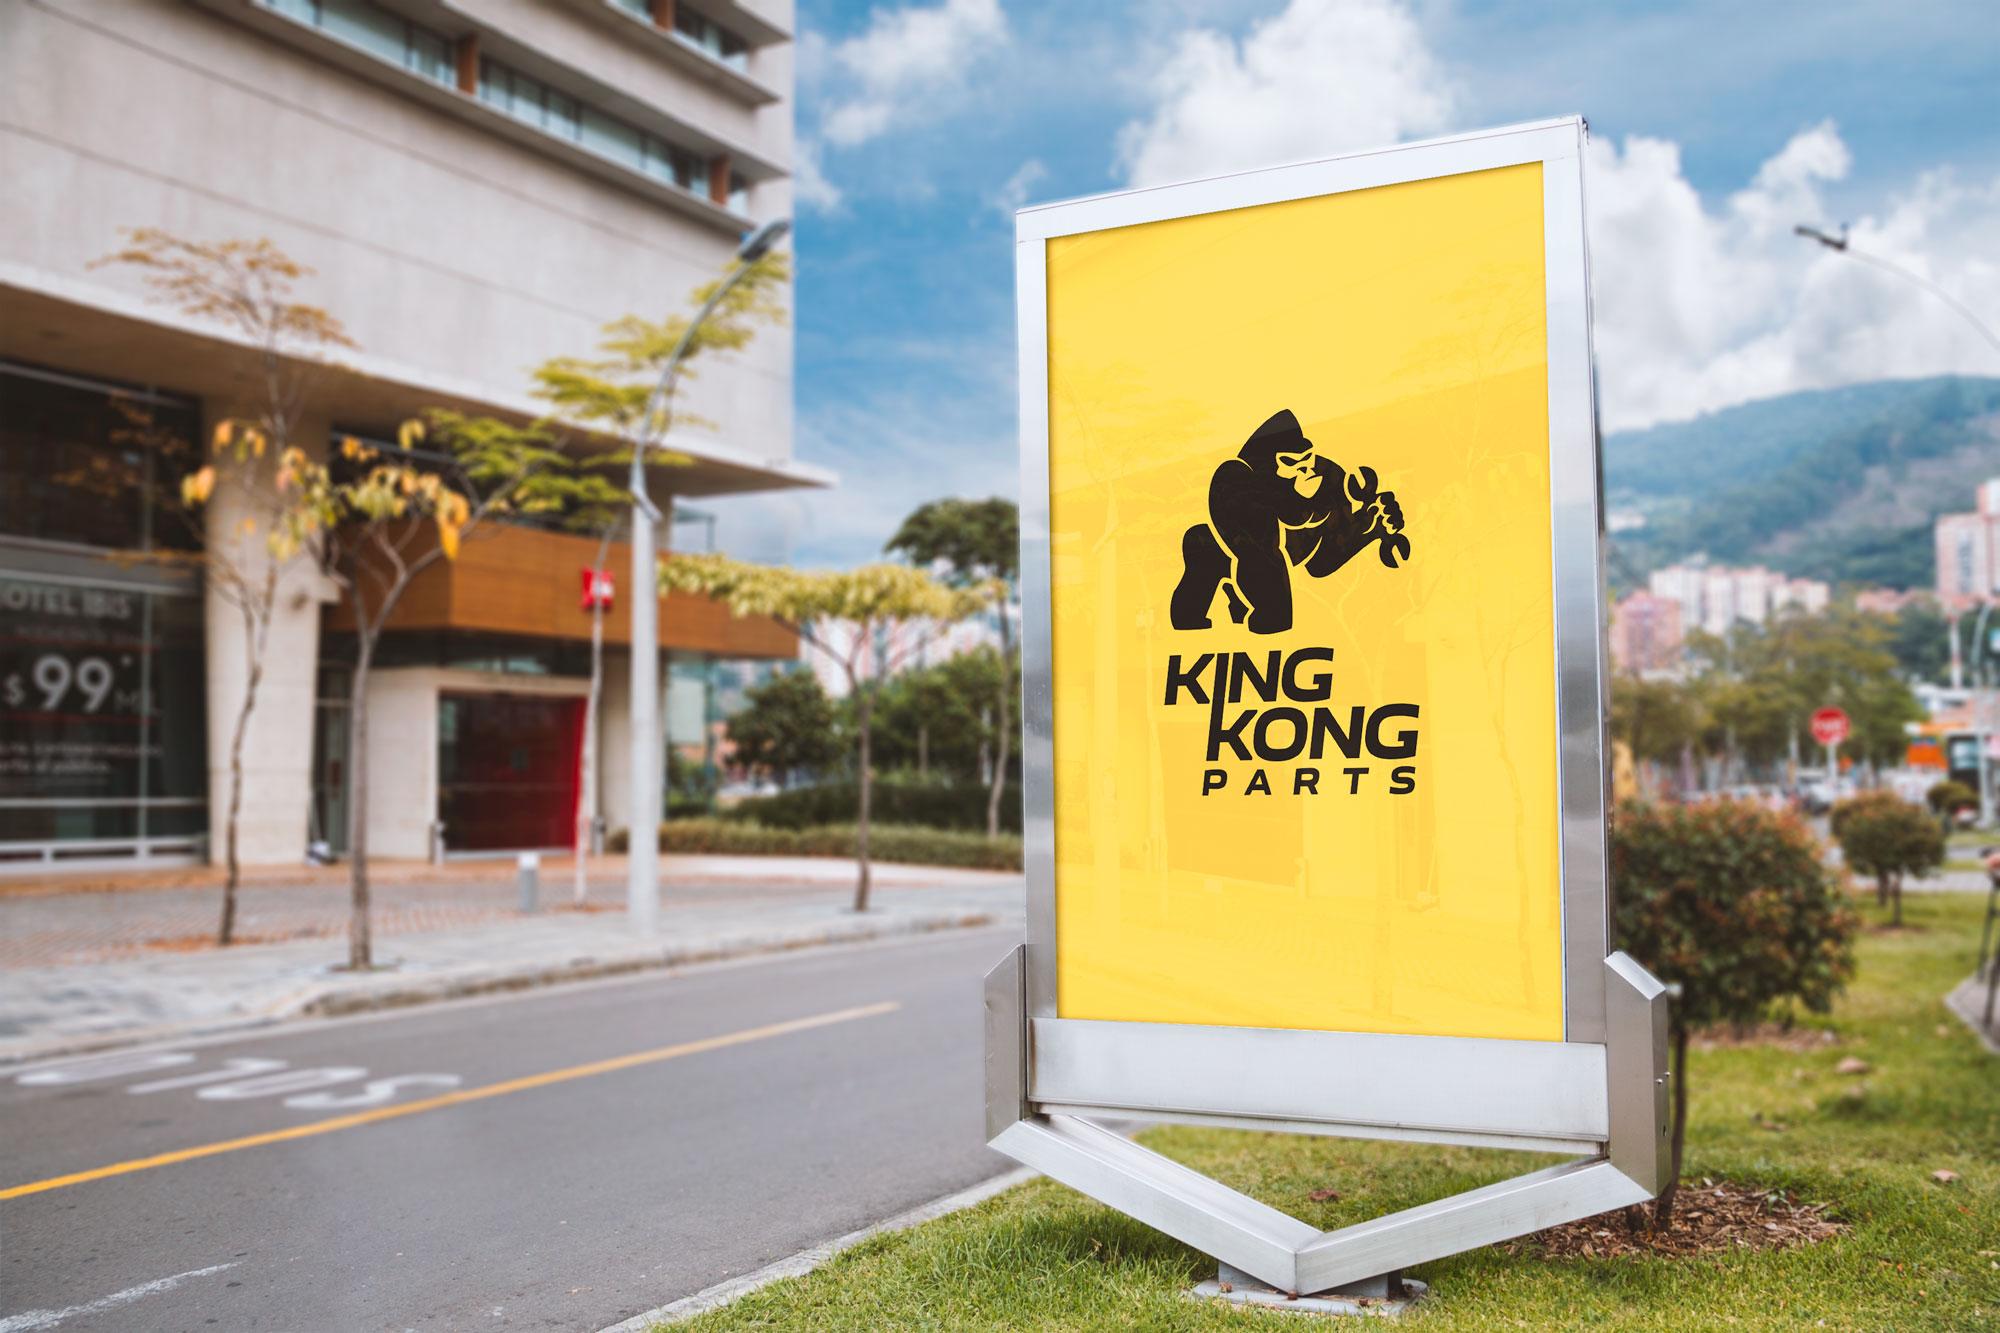 https://sconcept.be/wp-content/uploads/2019/04/kingkongparts-2.jpg